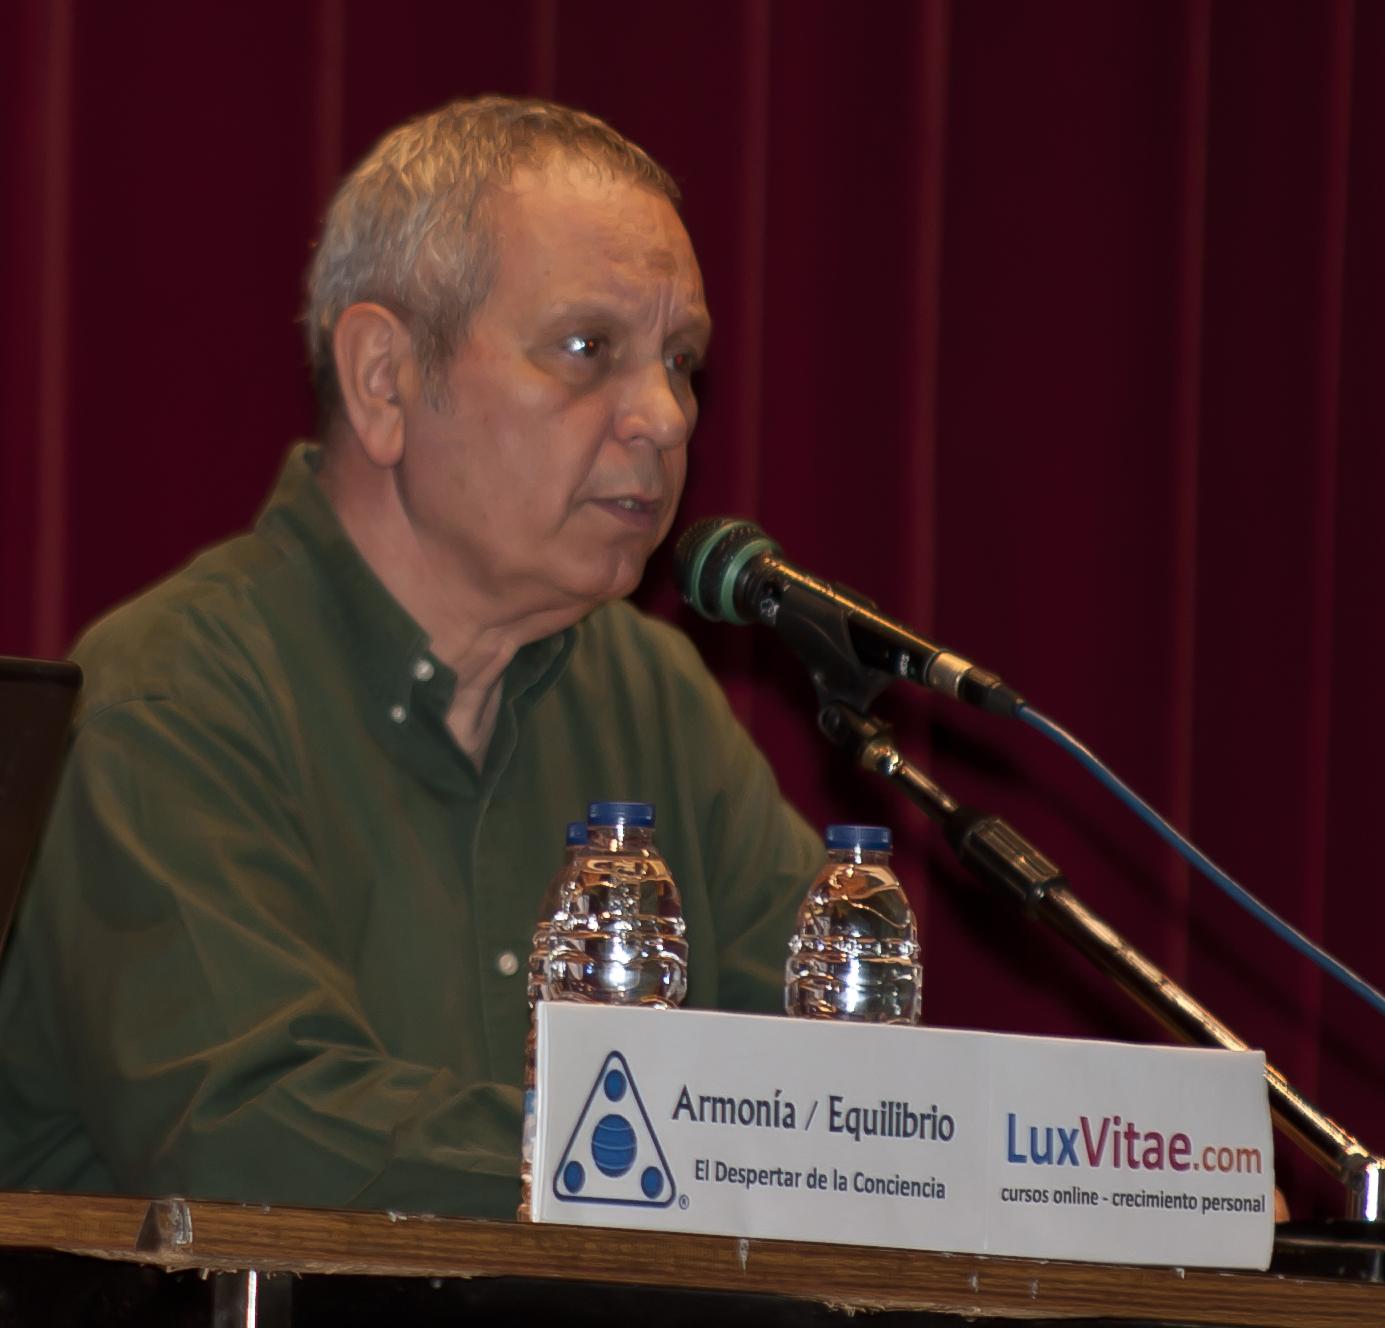 III Congreso Terapias Alternativas. Thutam Guillamot